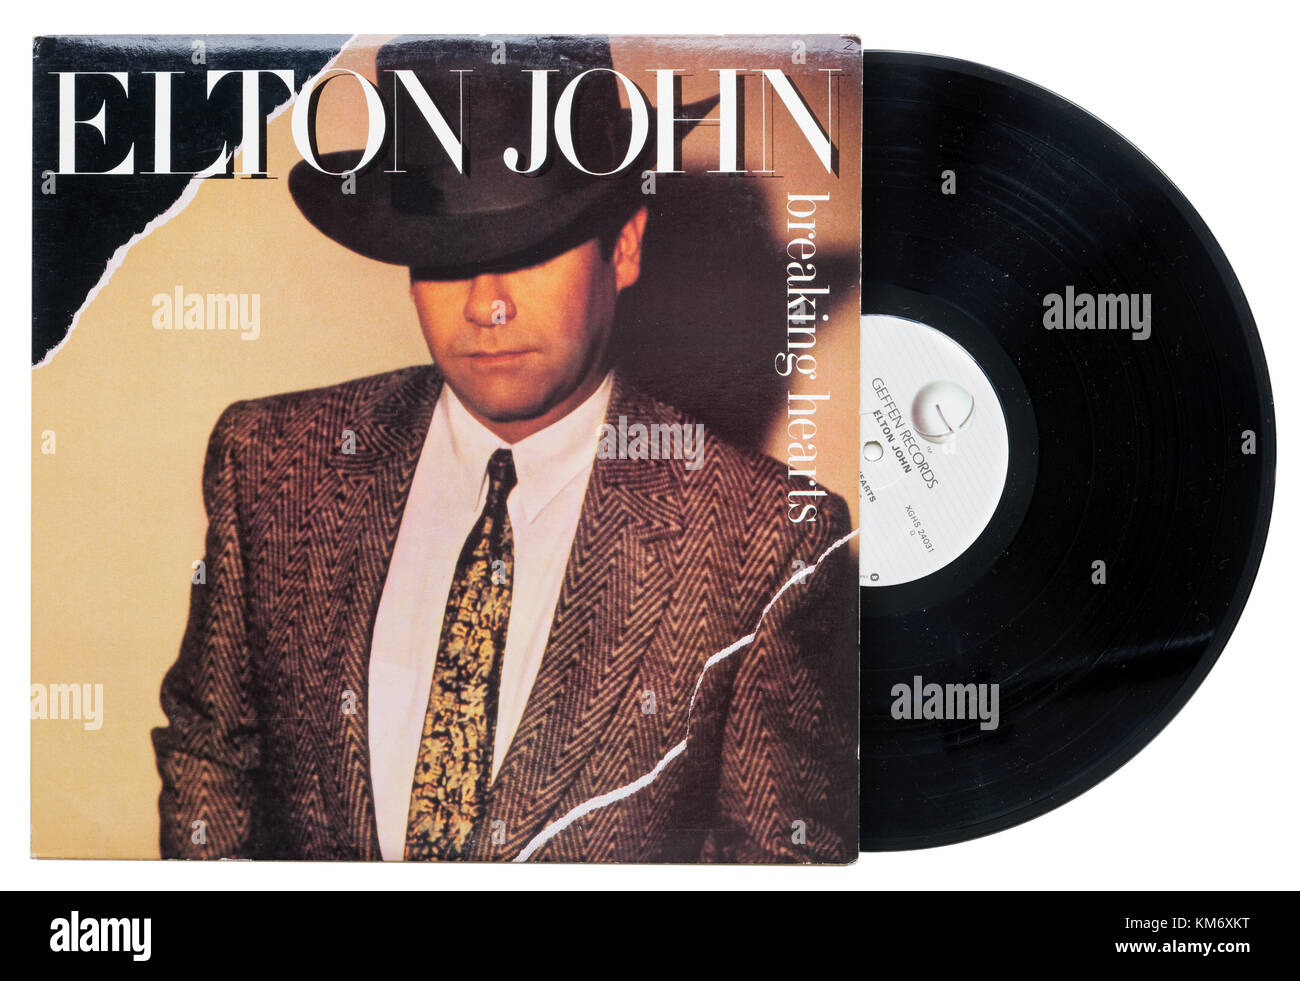 Elton John rompiendo corazones álbum Imagen De Stock